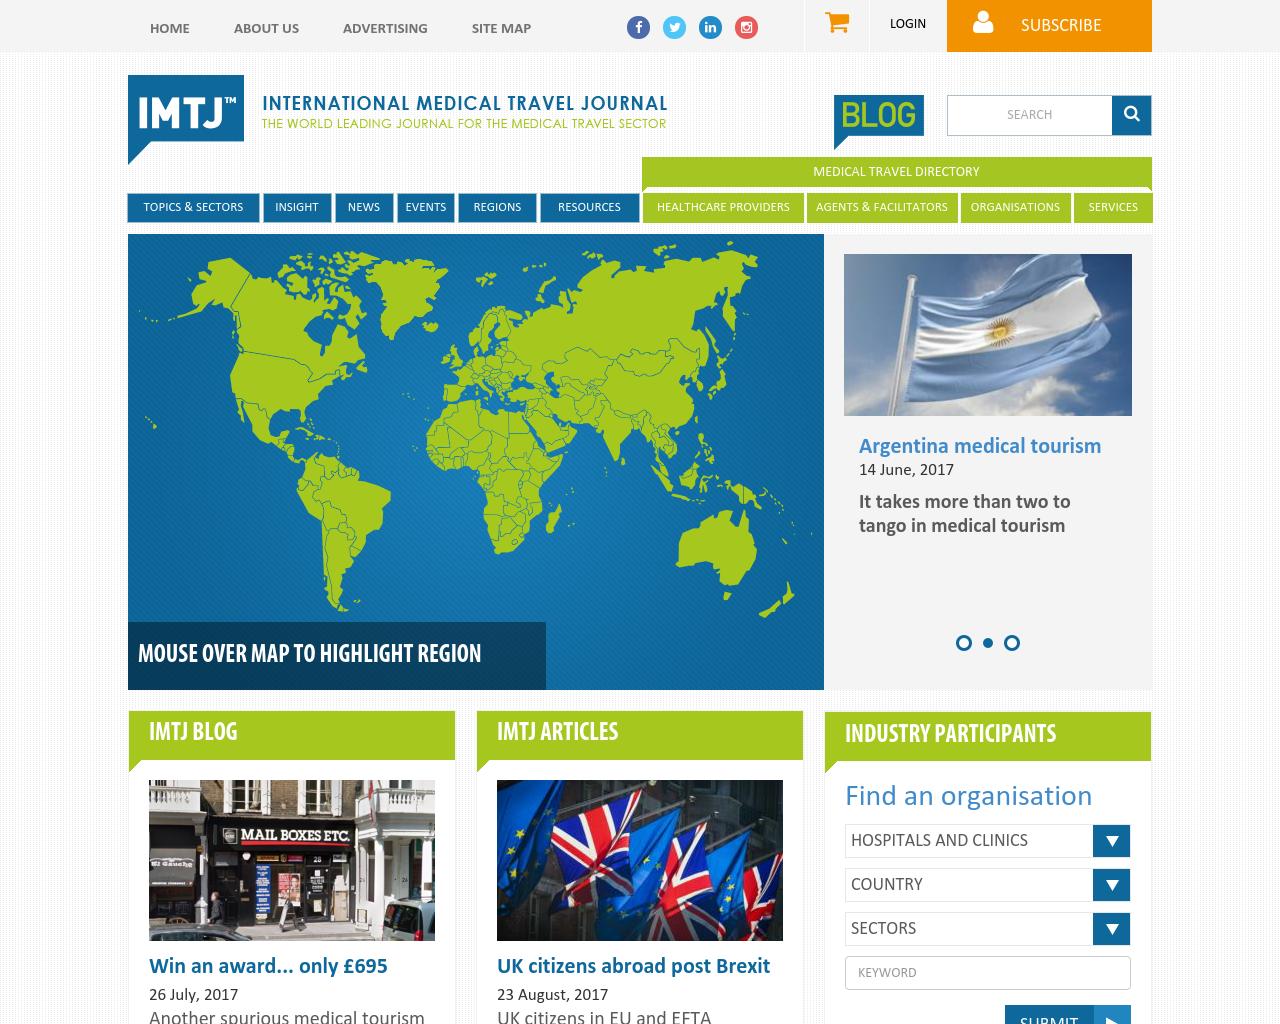 International-Medical-Travel-Journal-Advertising-Reviews-Pricing